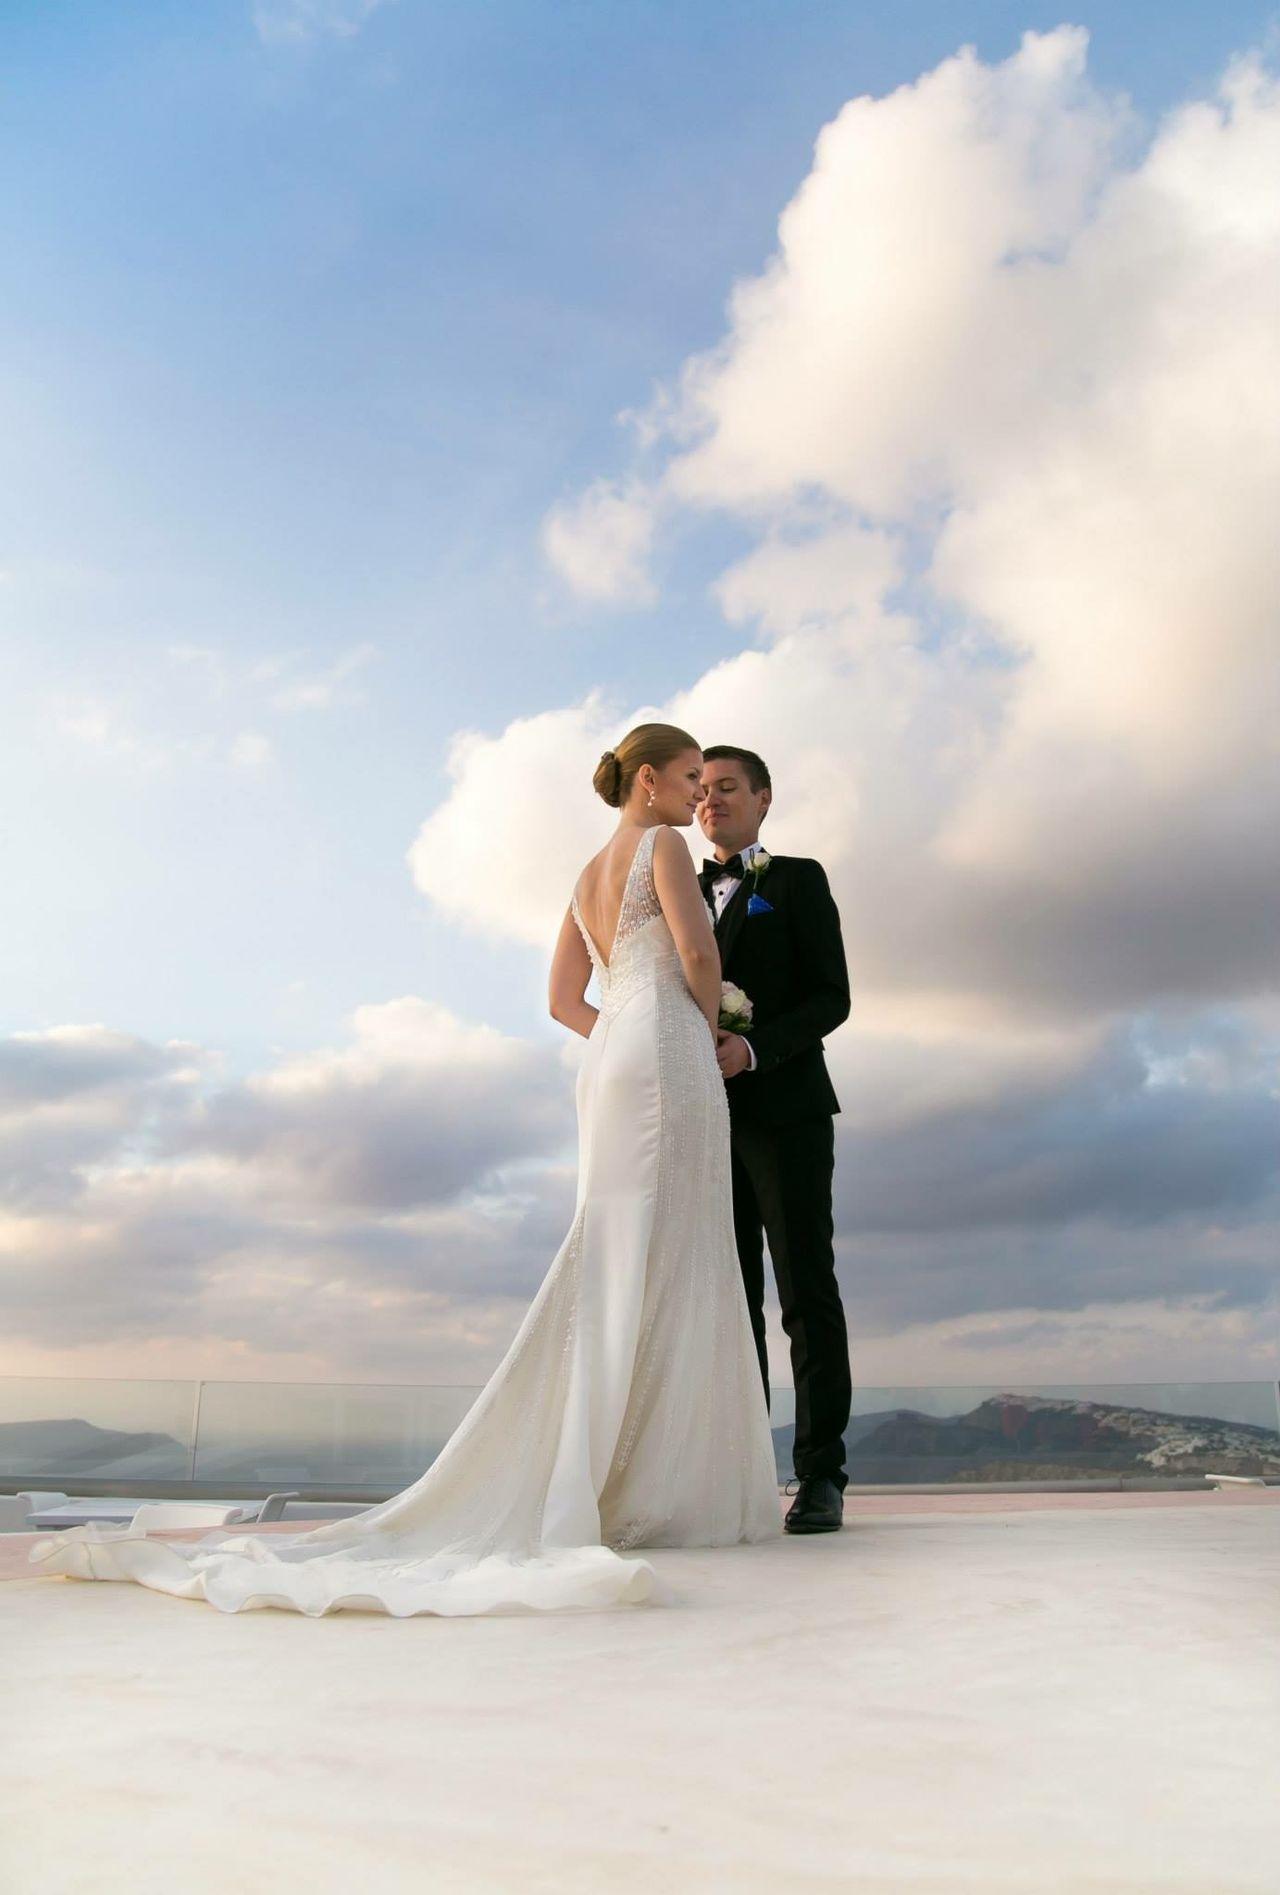 Beautiful stock photos of griechenland, 25-29 Years, Bonding, Bride, Bridegroom